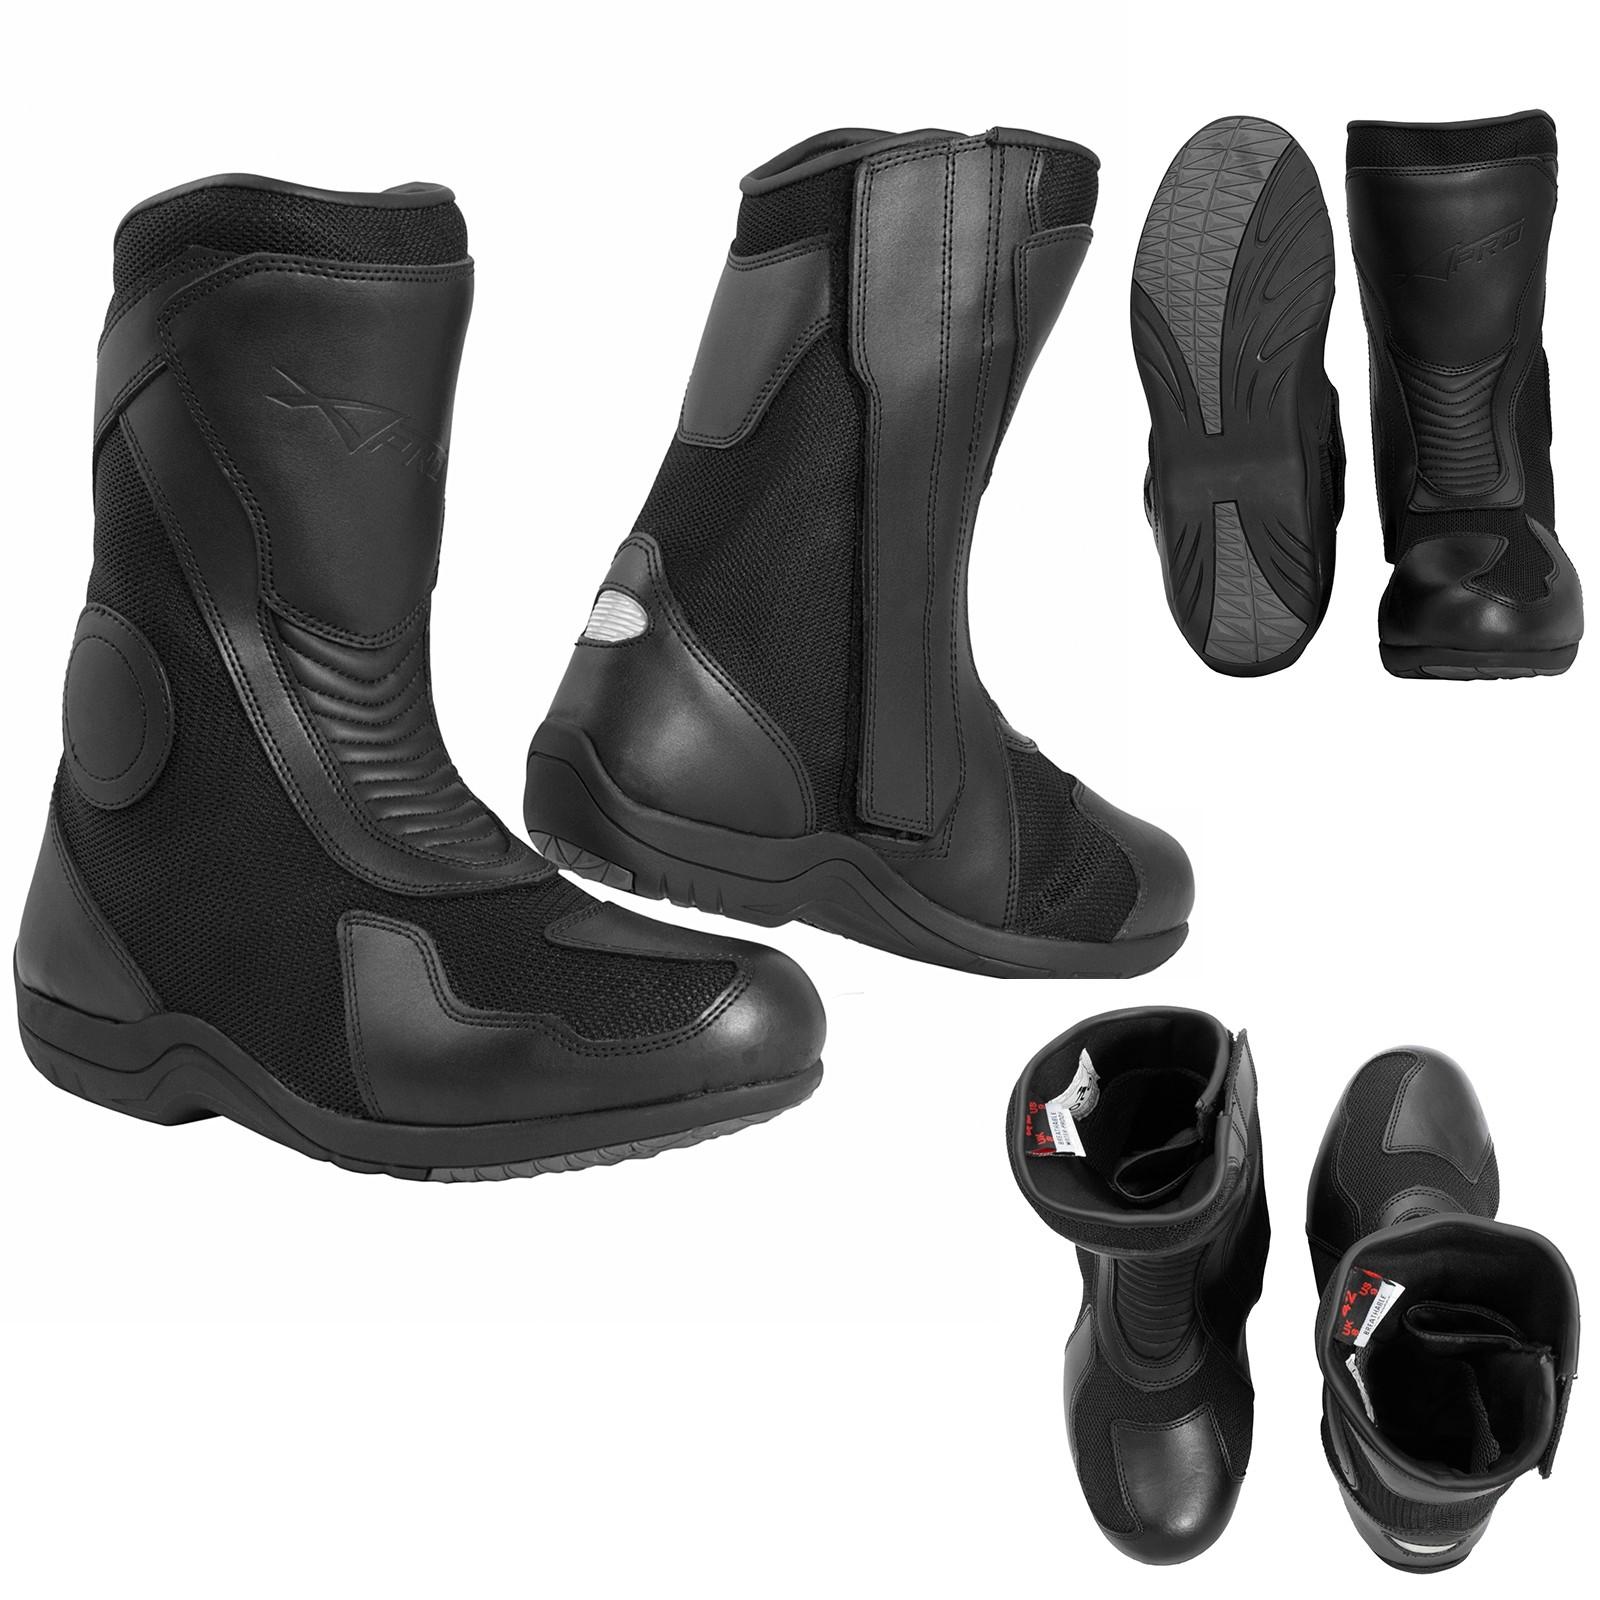 Toledo-Boots-Stivali-Motorcycle-Nero-Black-A-Pro-Sonic-Moto-Set